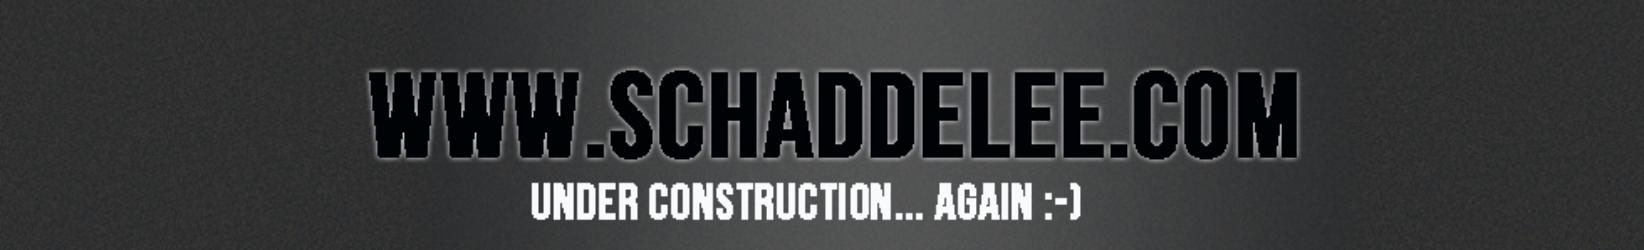 Schaddelee.com